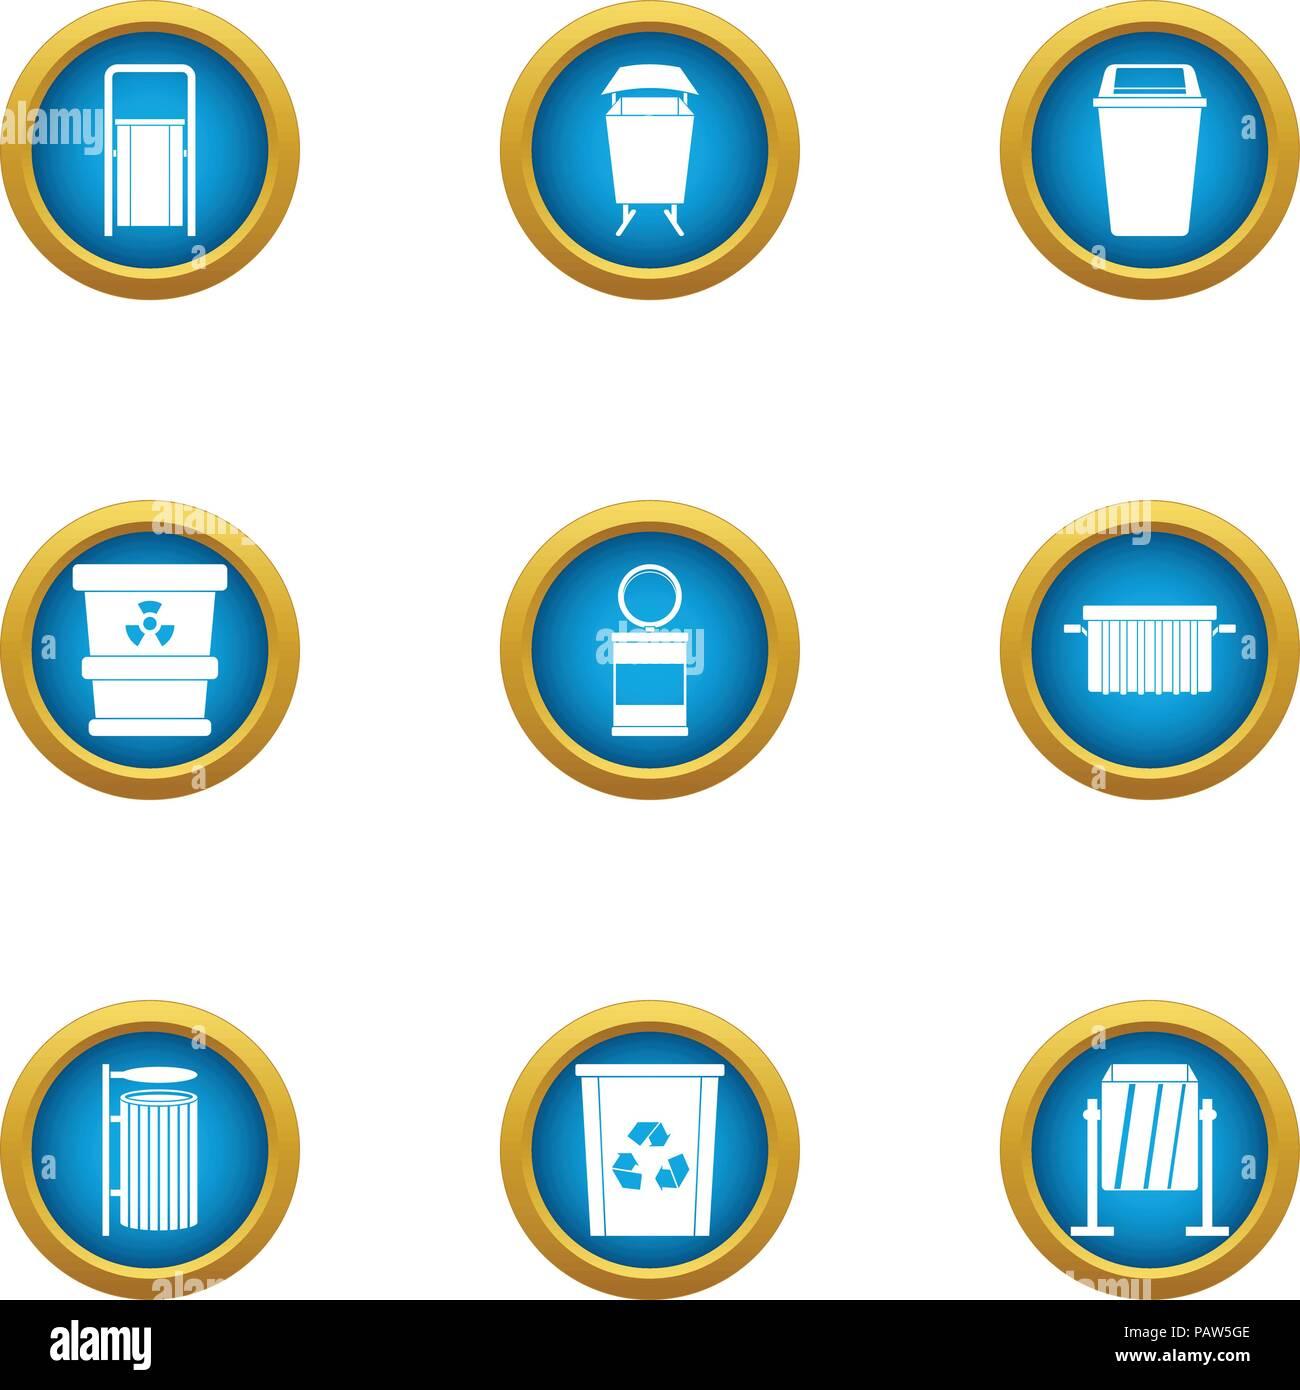 Elemental composition icons set, flat style - Stock Image